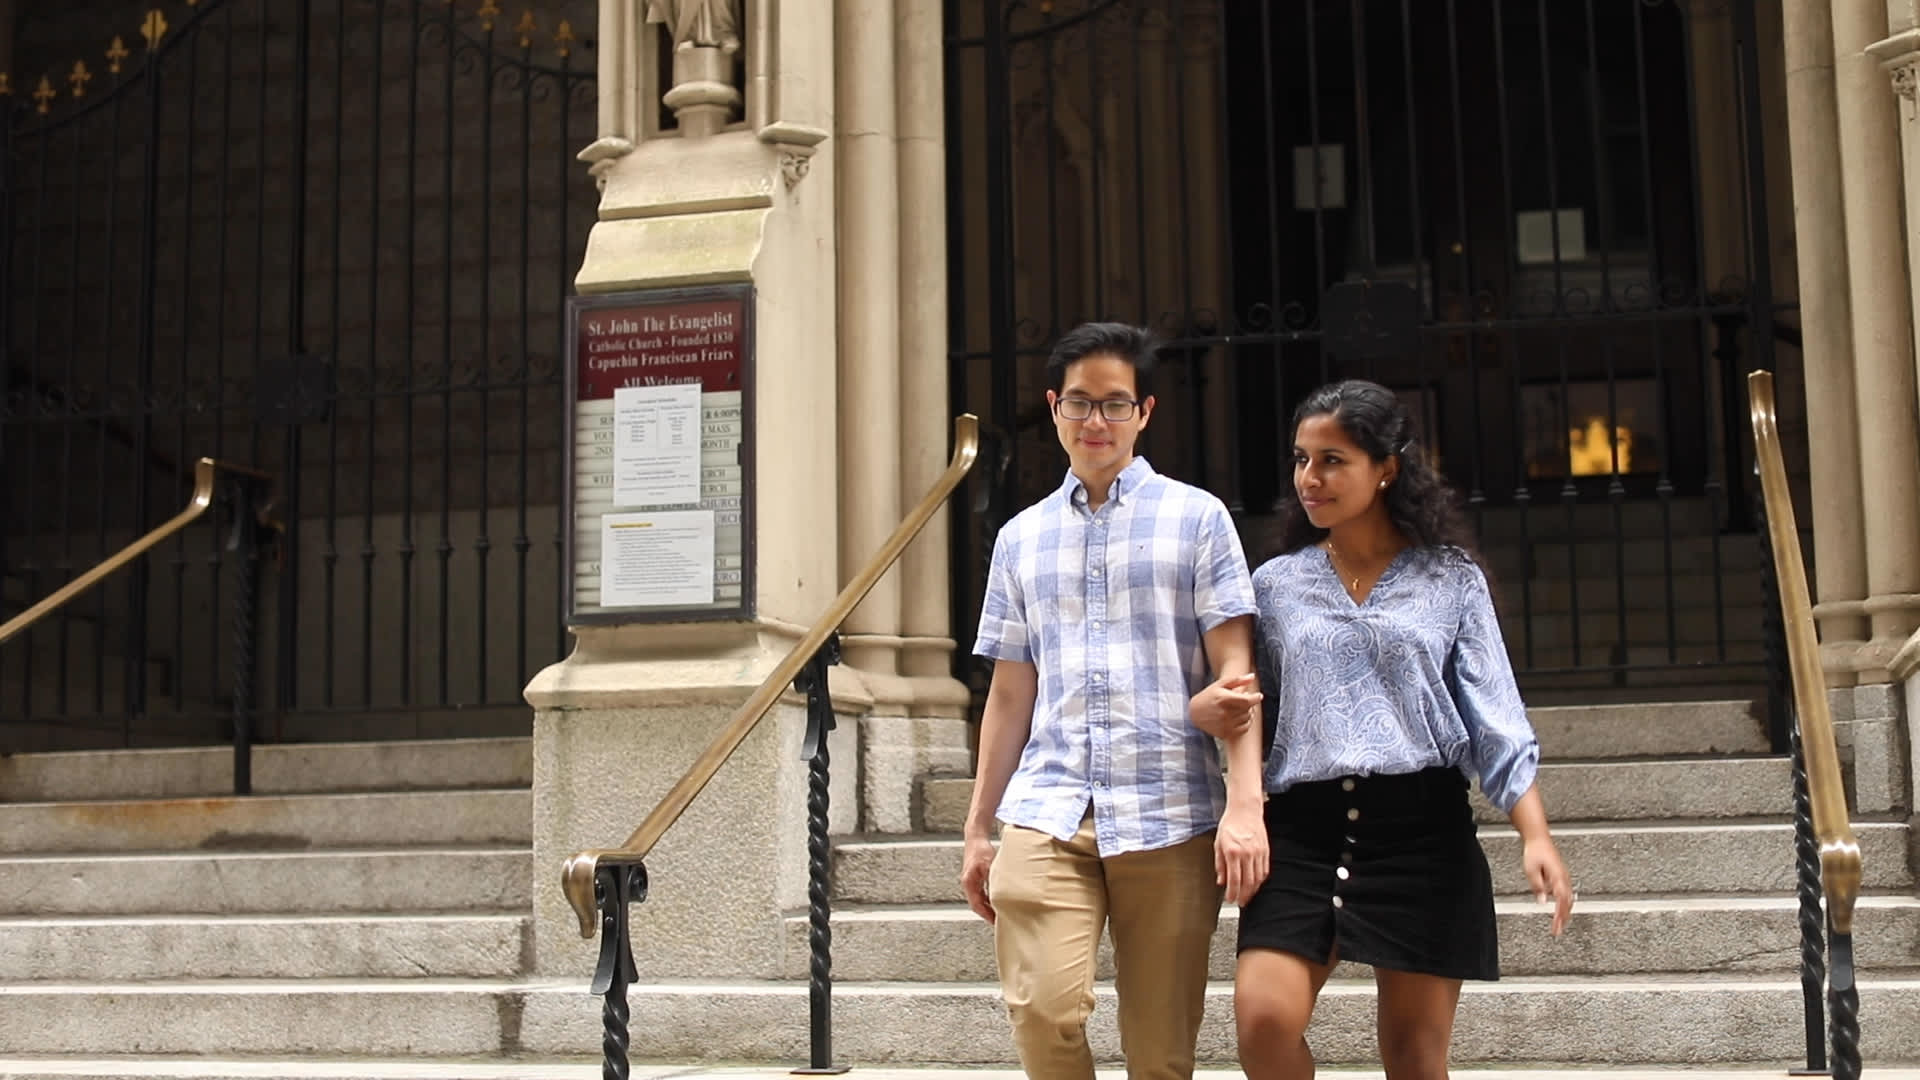 Tiu and Chorath share their Catholic faith.